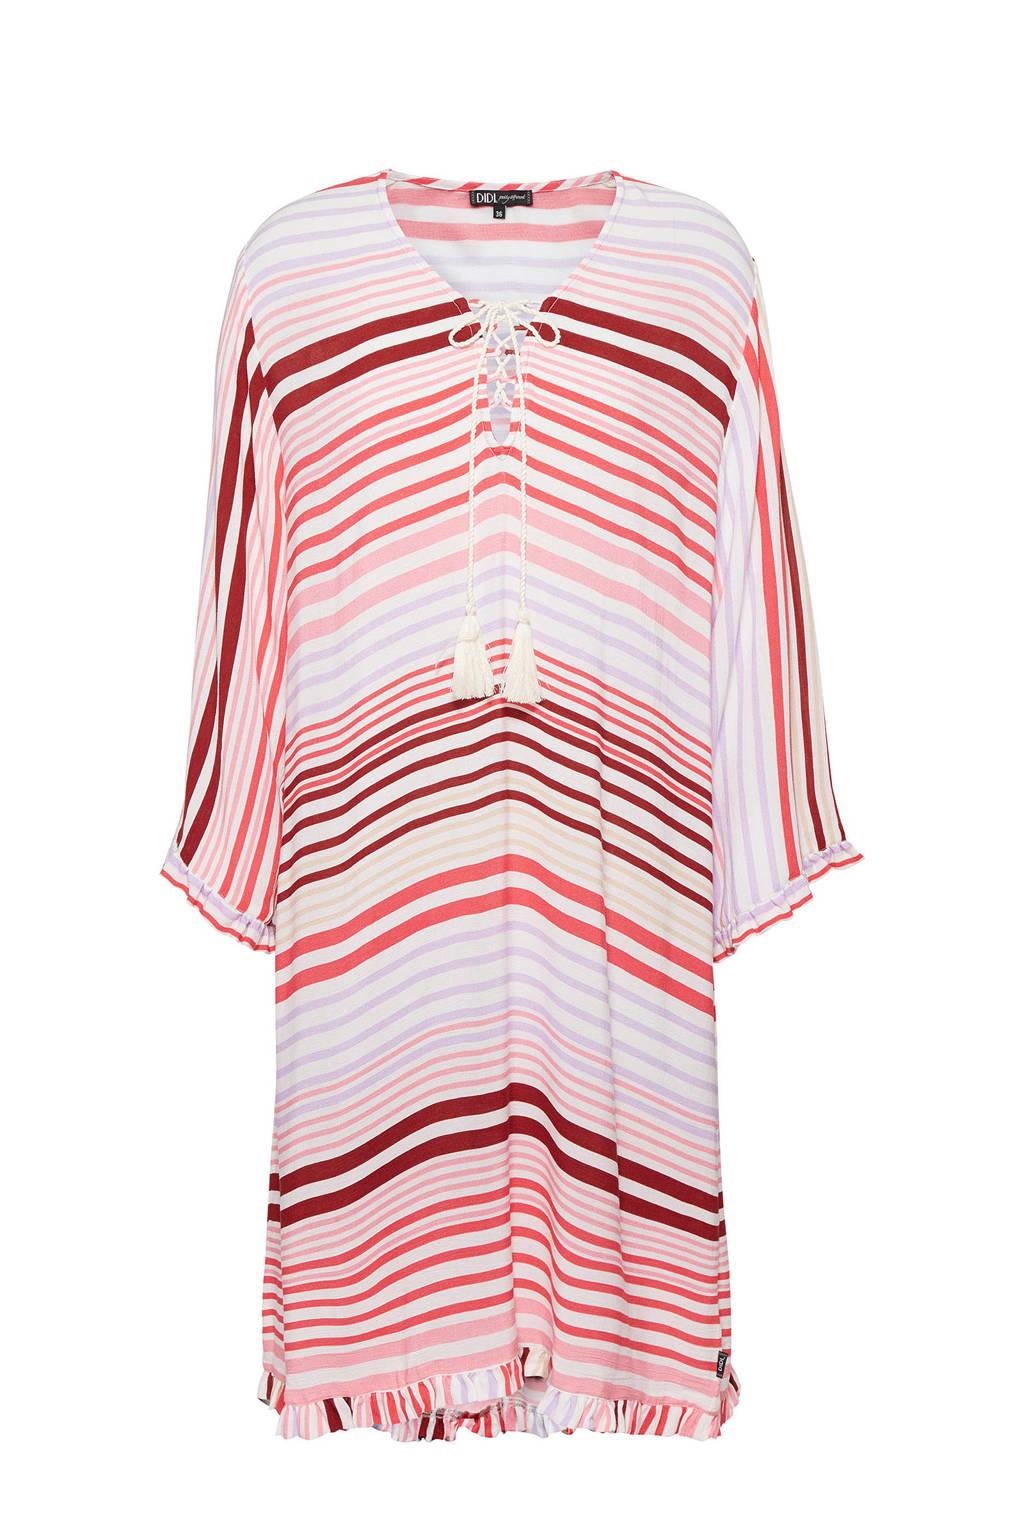 Didi gestreepte oversized jurk ecru/rood, Ecru/rood